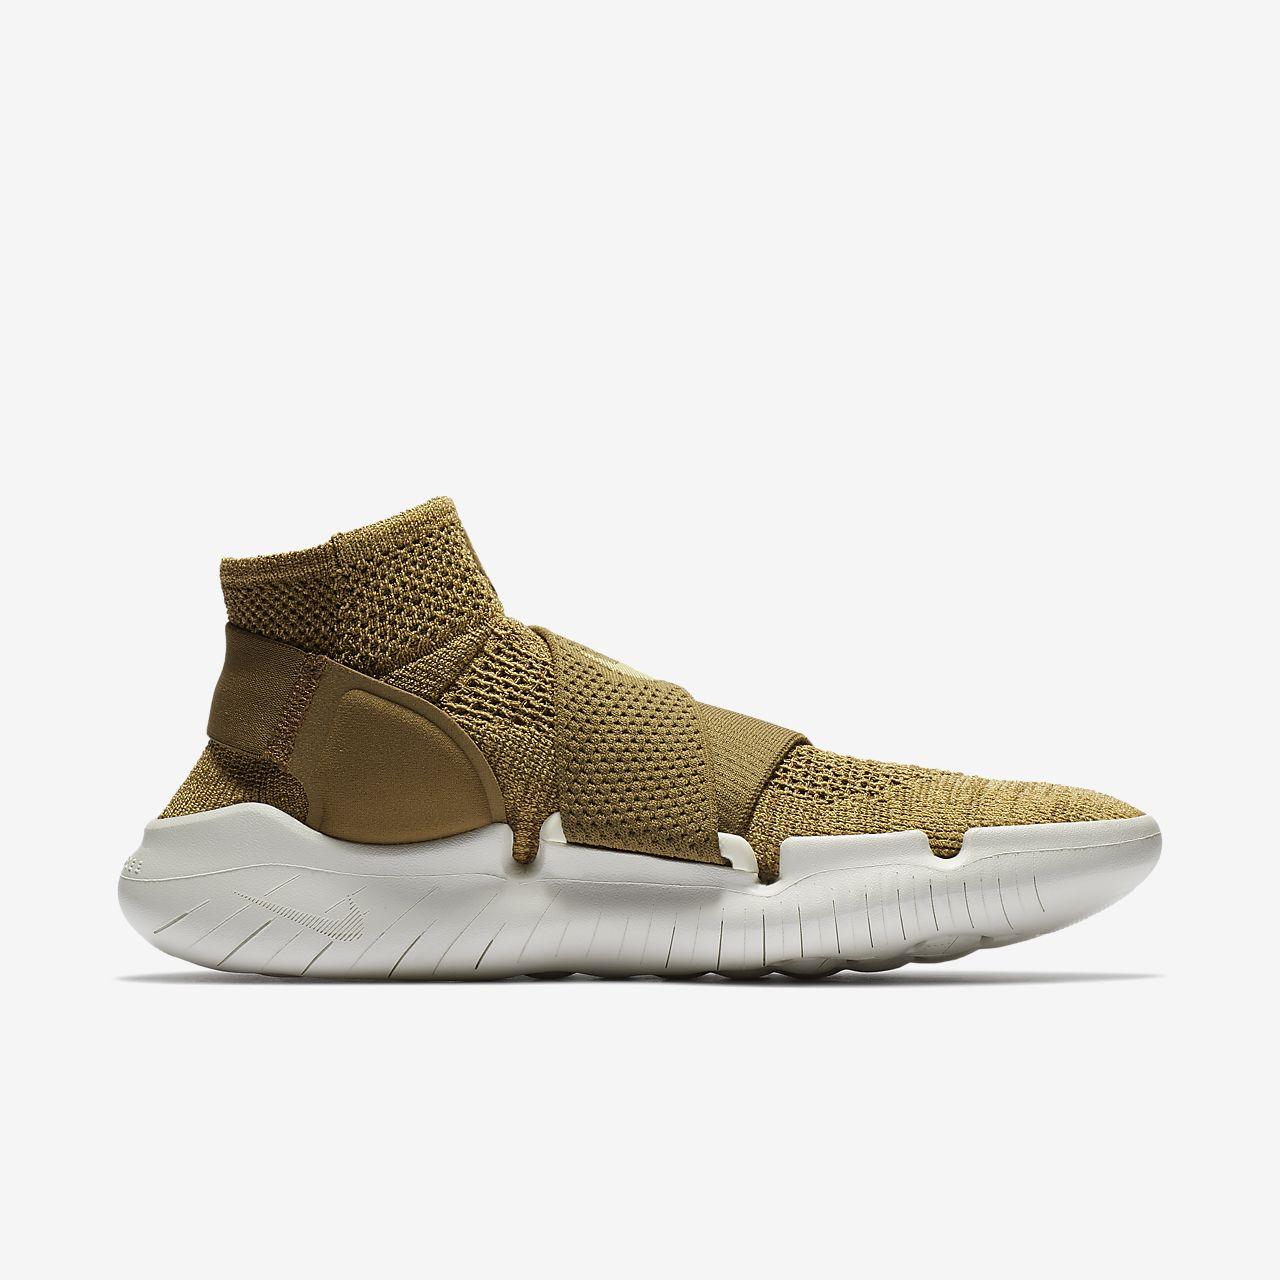 9716def629825 Nike Free RN Motion Flyknit 2018 Men s Running Shoe. Nike.com